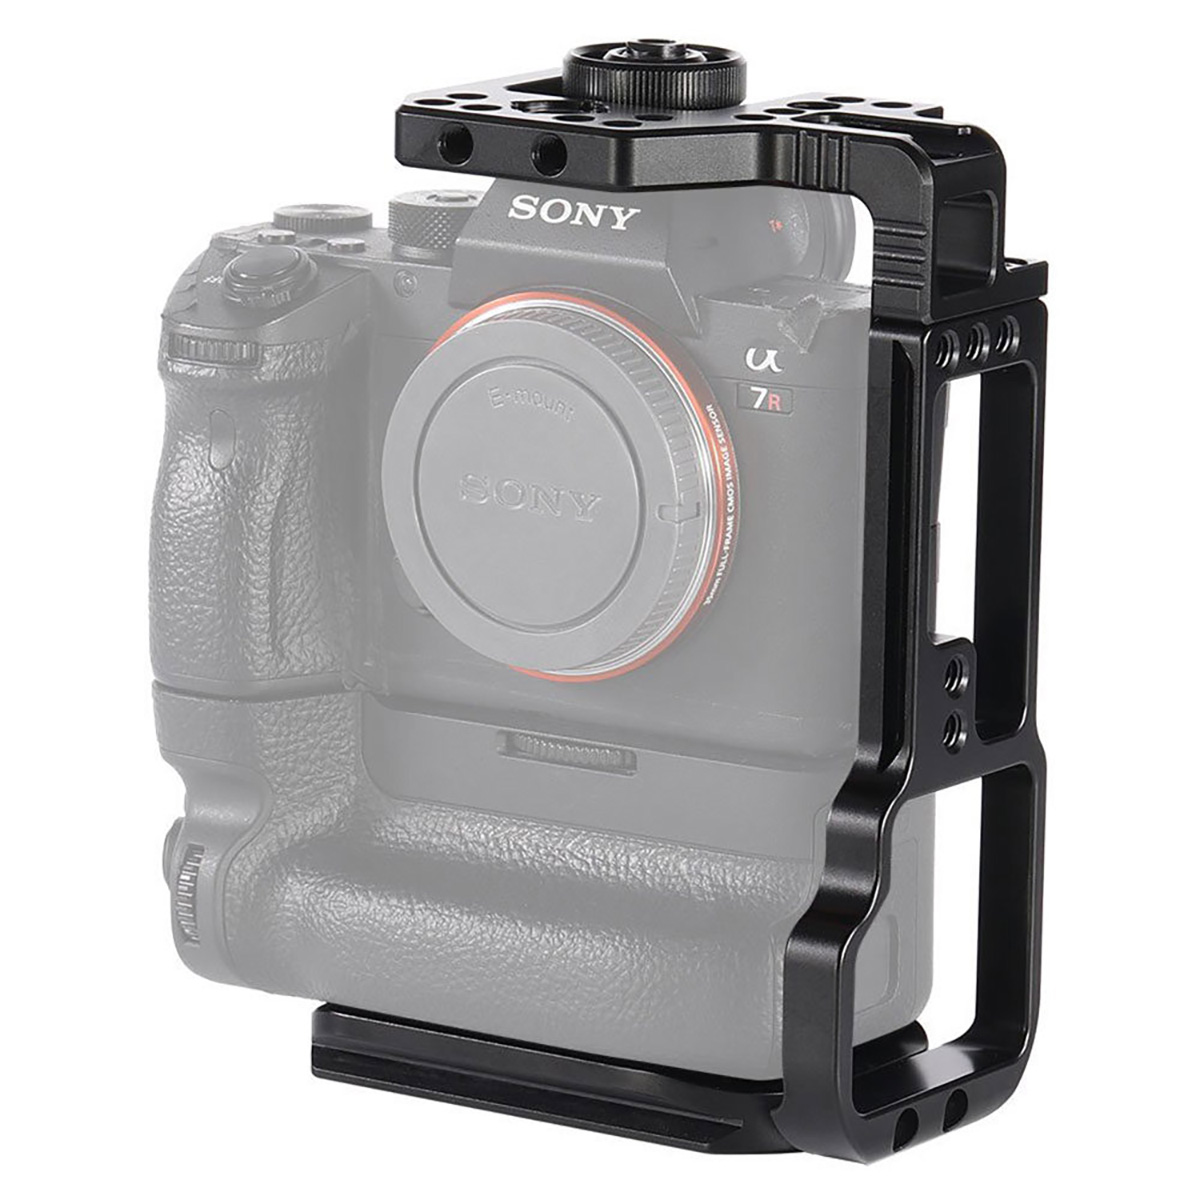 SmallRig L-Winkel für Sony A7III / A7RIII / A9 mit Batterie-Griff 2341